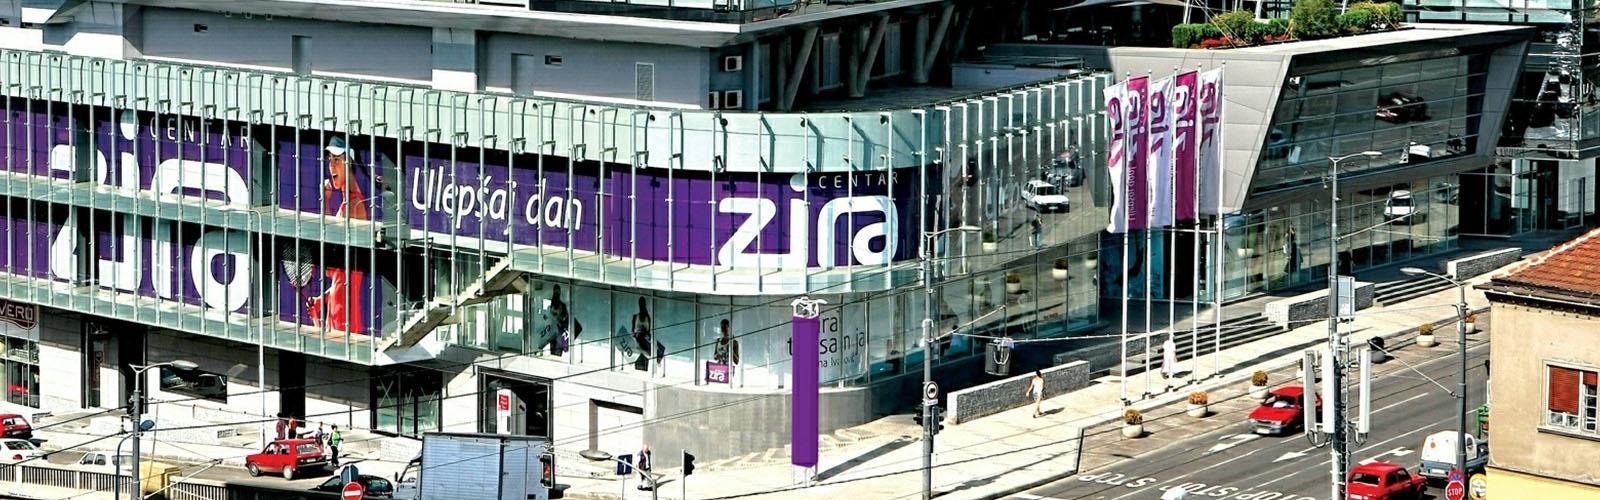 Concierge Belgrade | Zira shopping mall